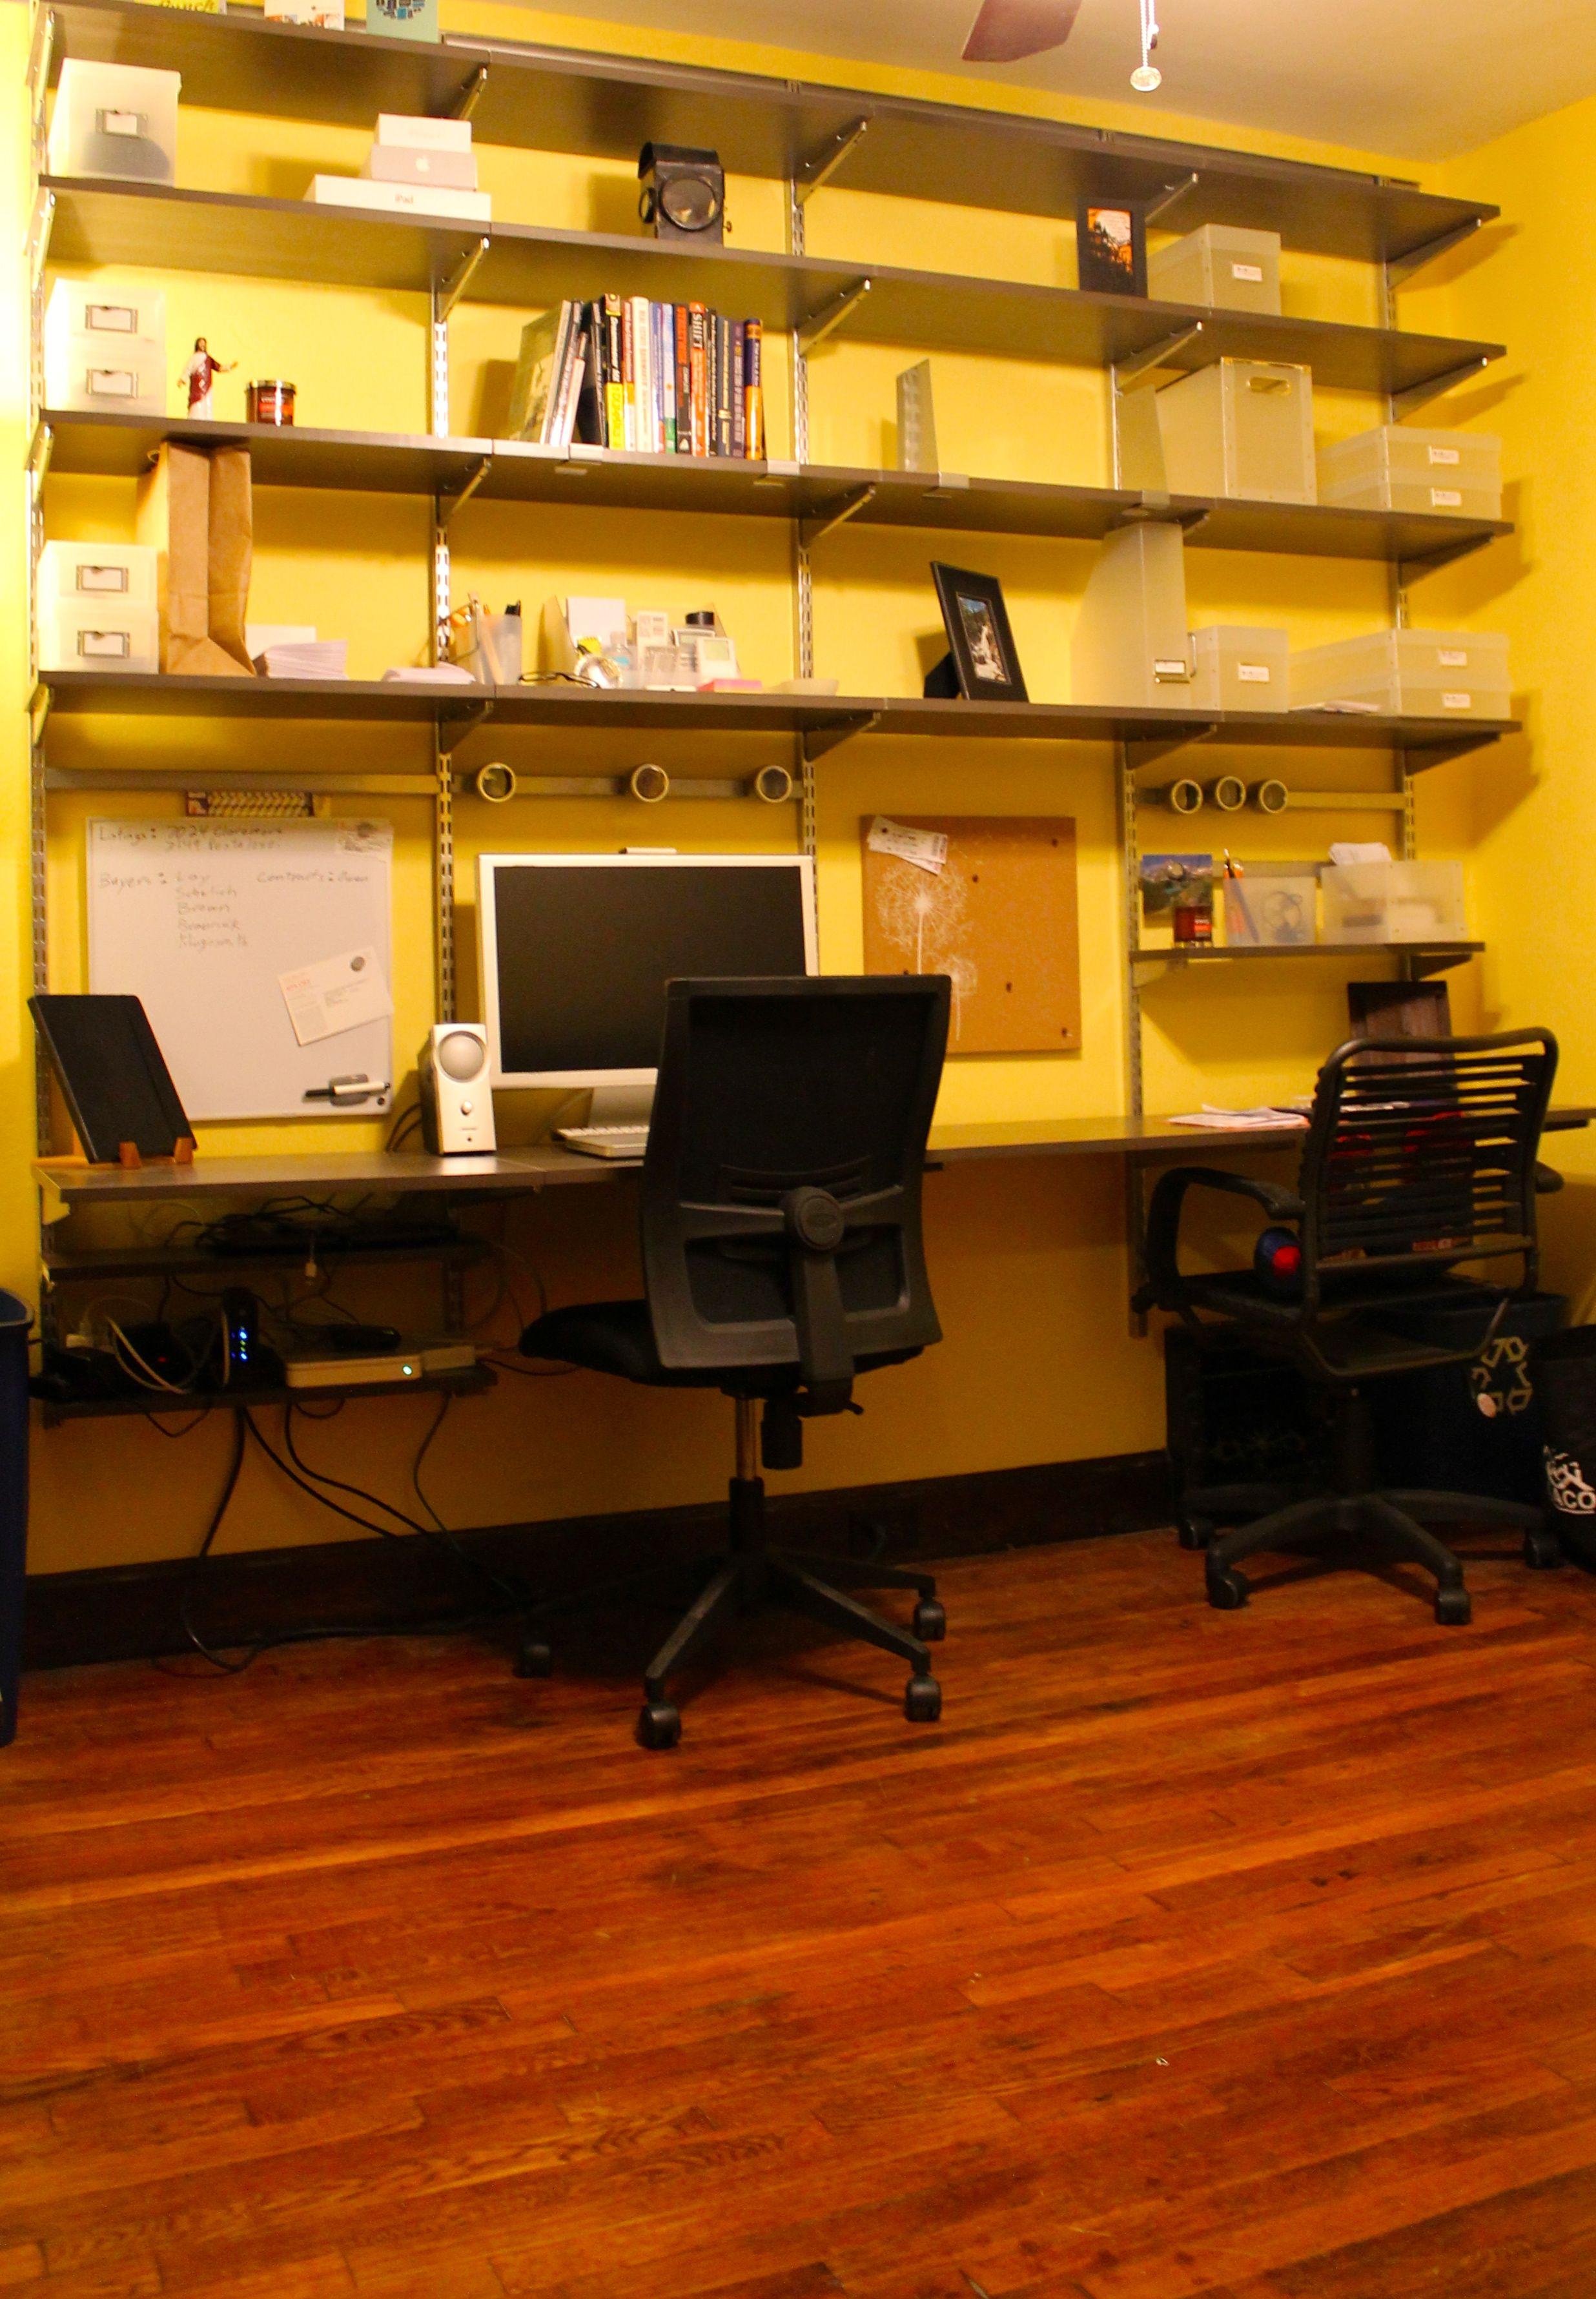 Finally Finished Putting Together My Elfa Shelving System   I Love  Organization!